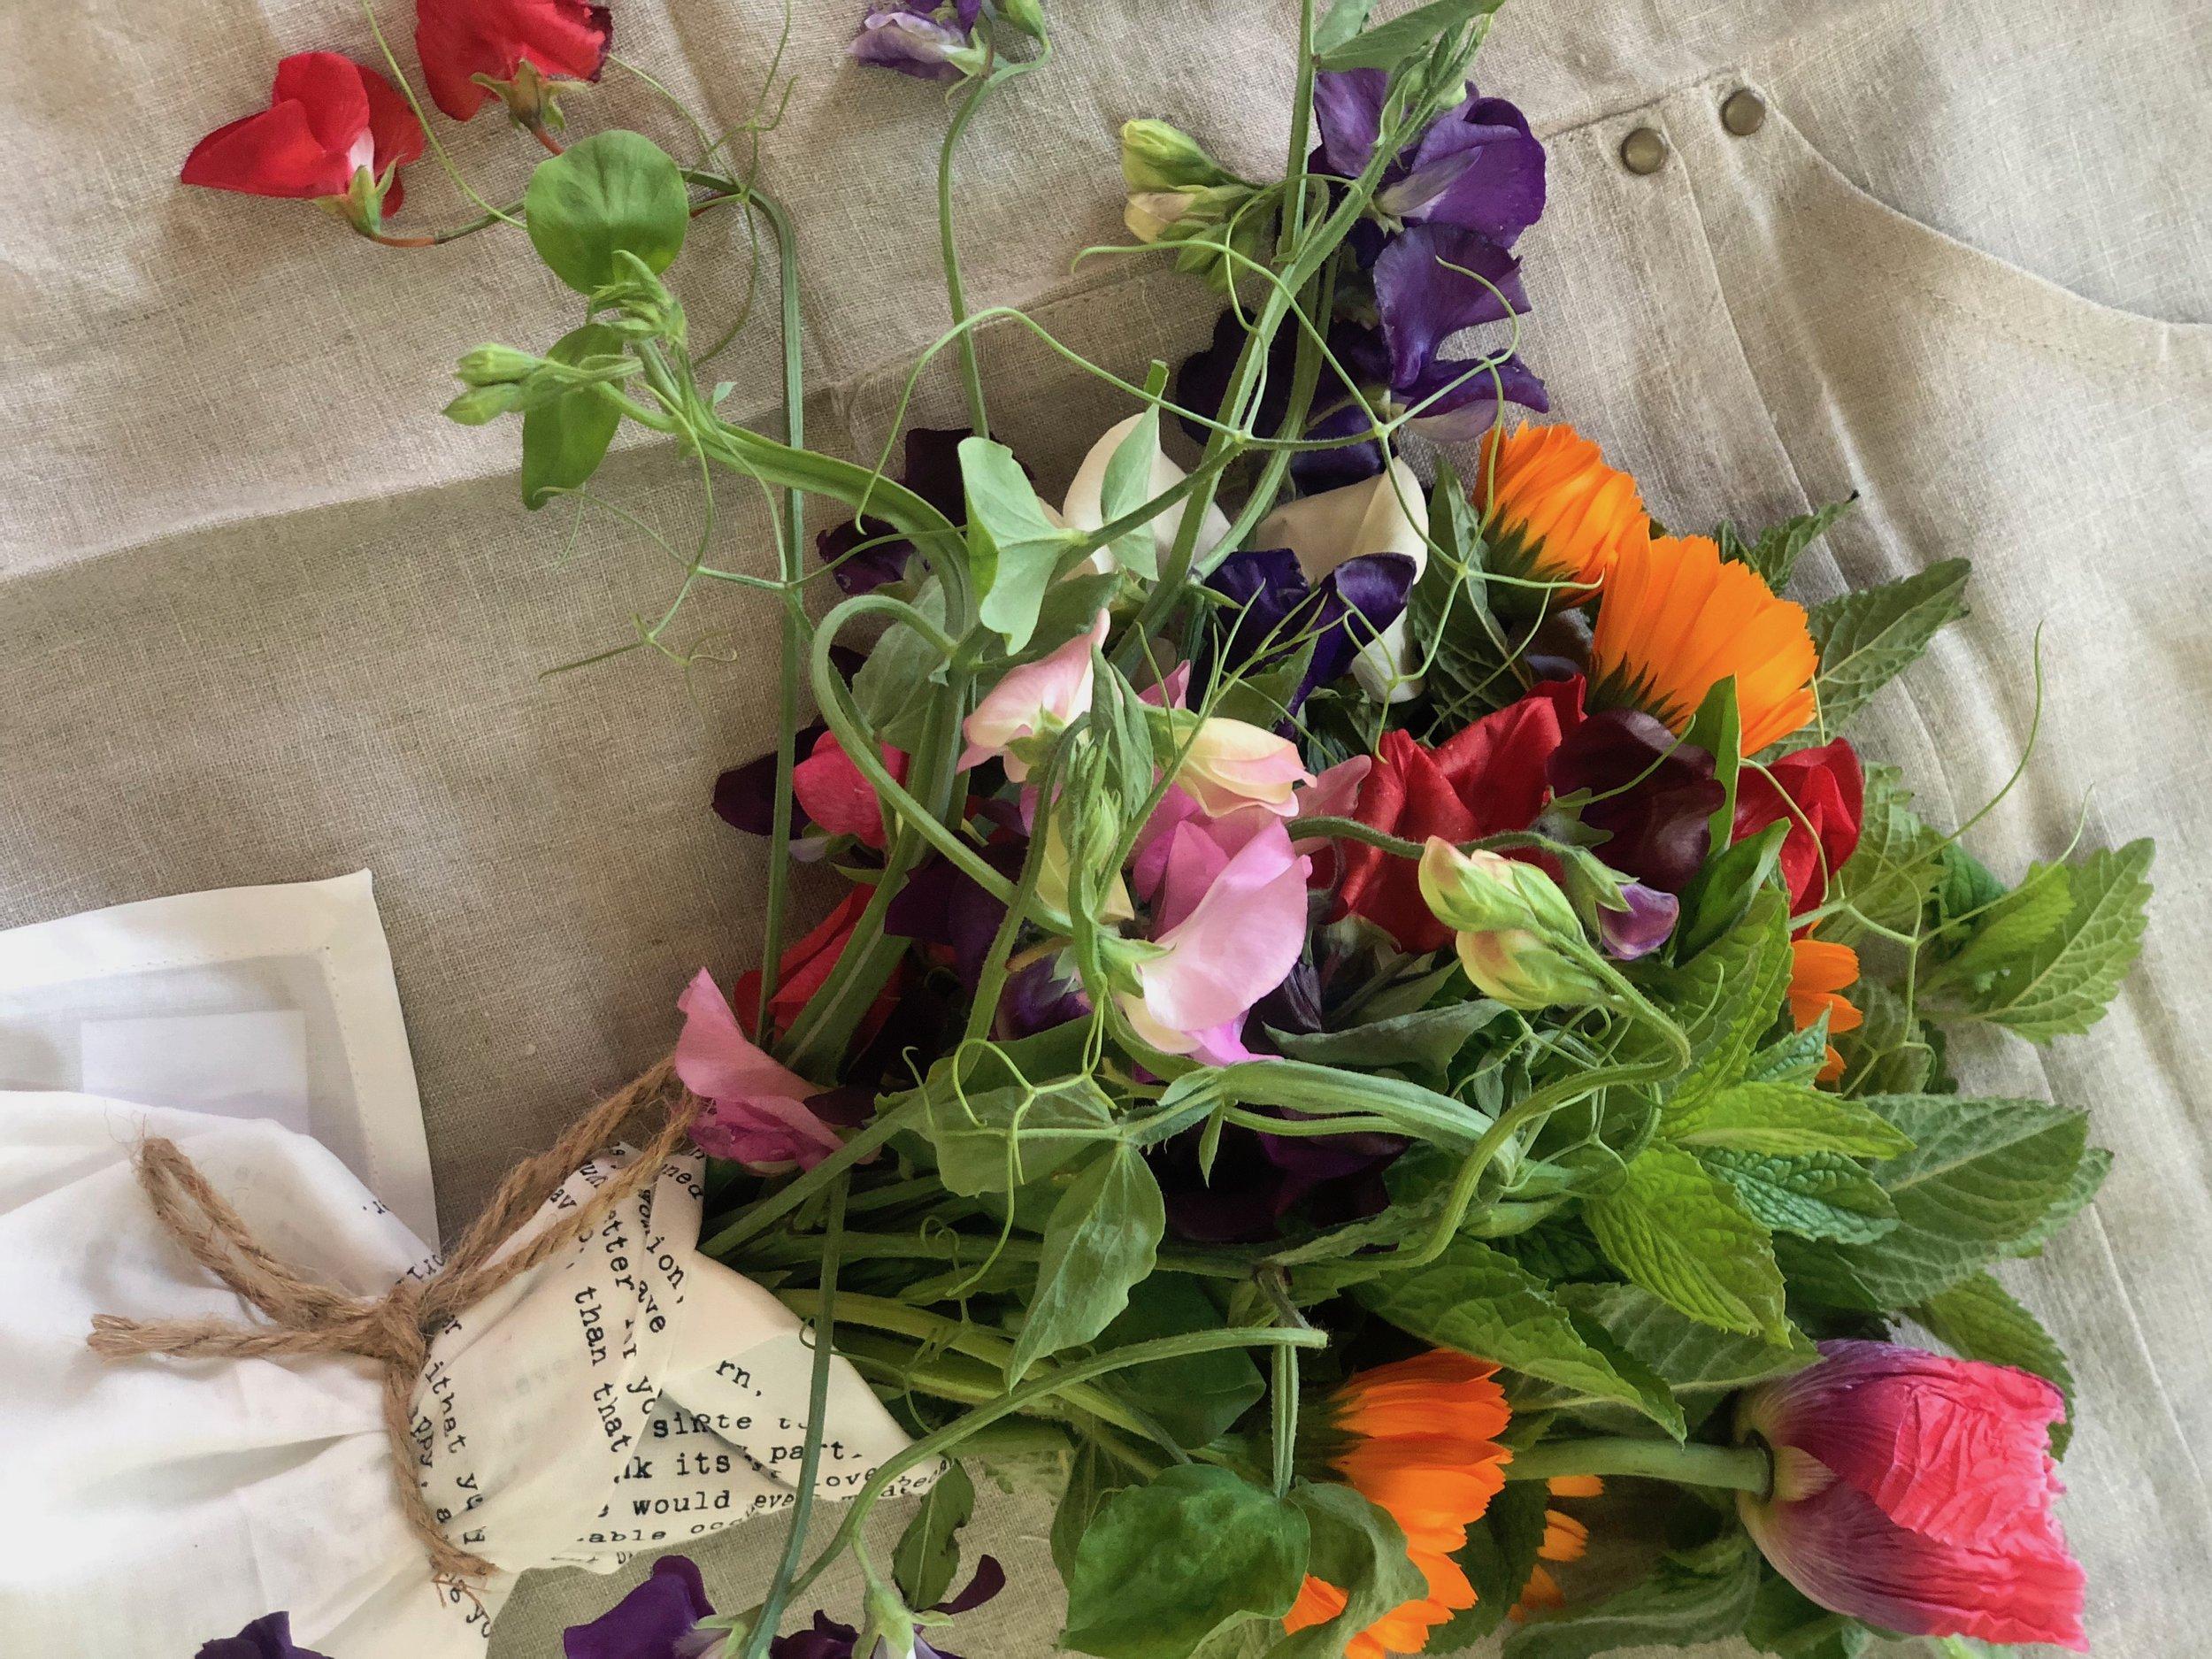 Market Bouquet/ S tone Hollow Farmstead - Harpersville, Alabama